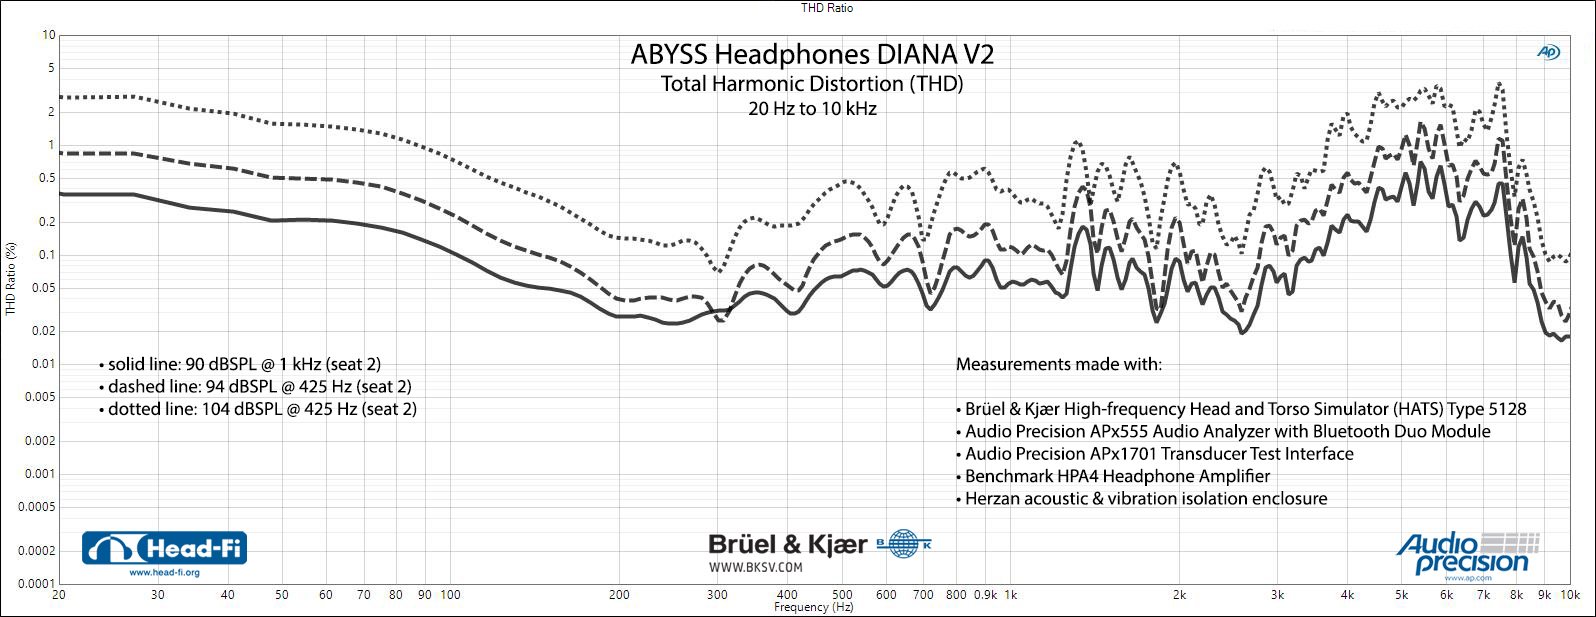 Abyss-Headphones-Diana-V2---SEAT-02---AVG-THD---90-dBSPL-1-kHz---94-dBSPL-425-Hz---104-dBSPL-4...jpg